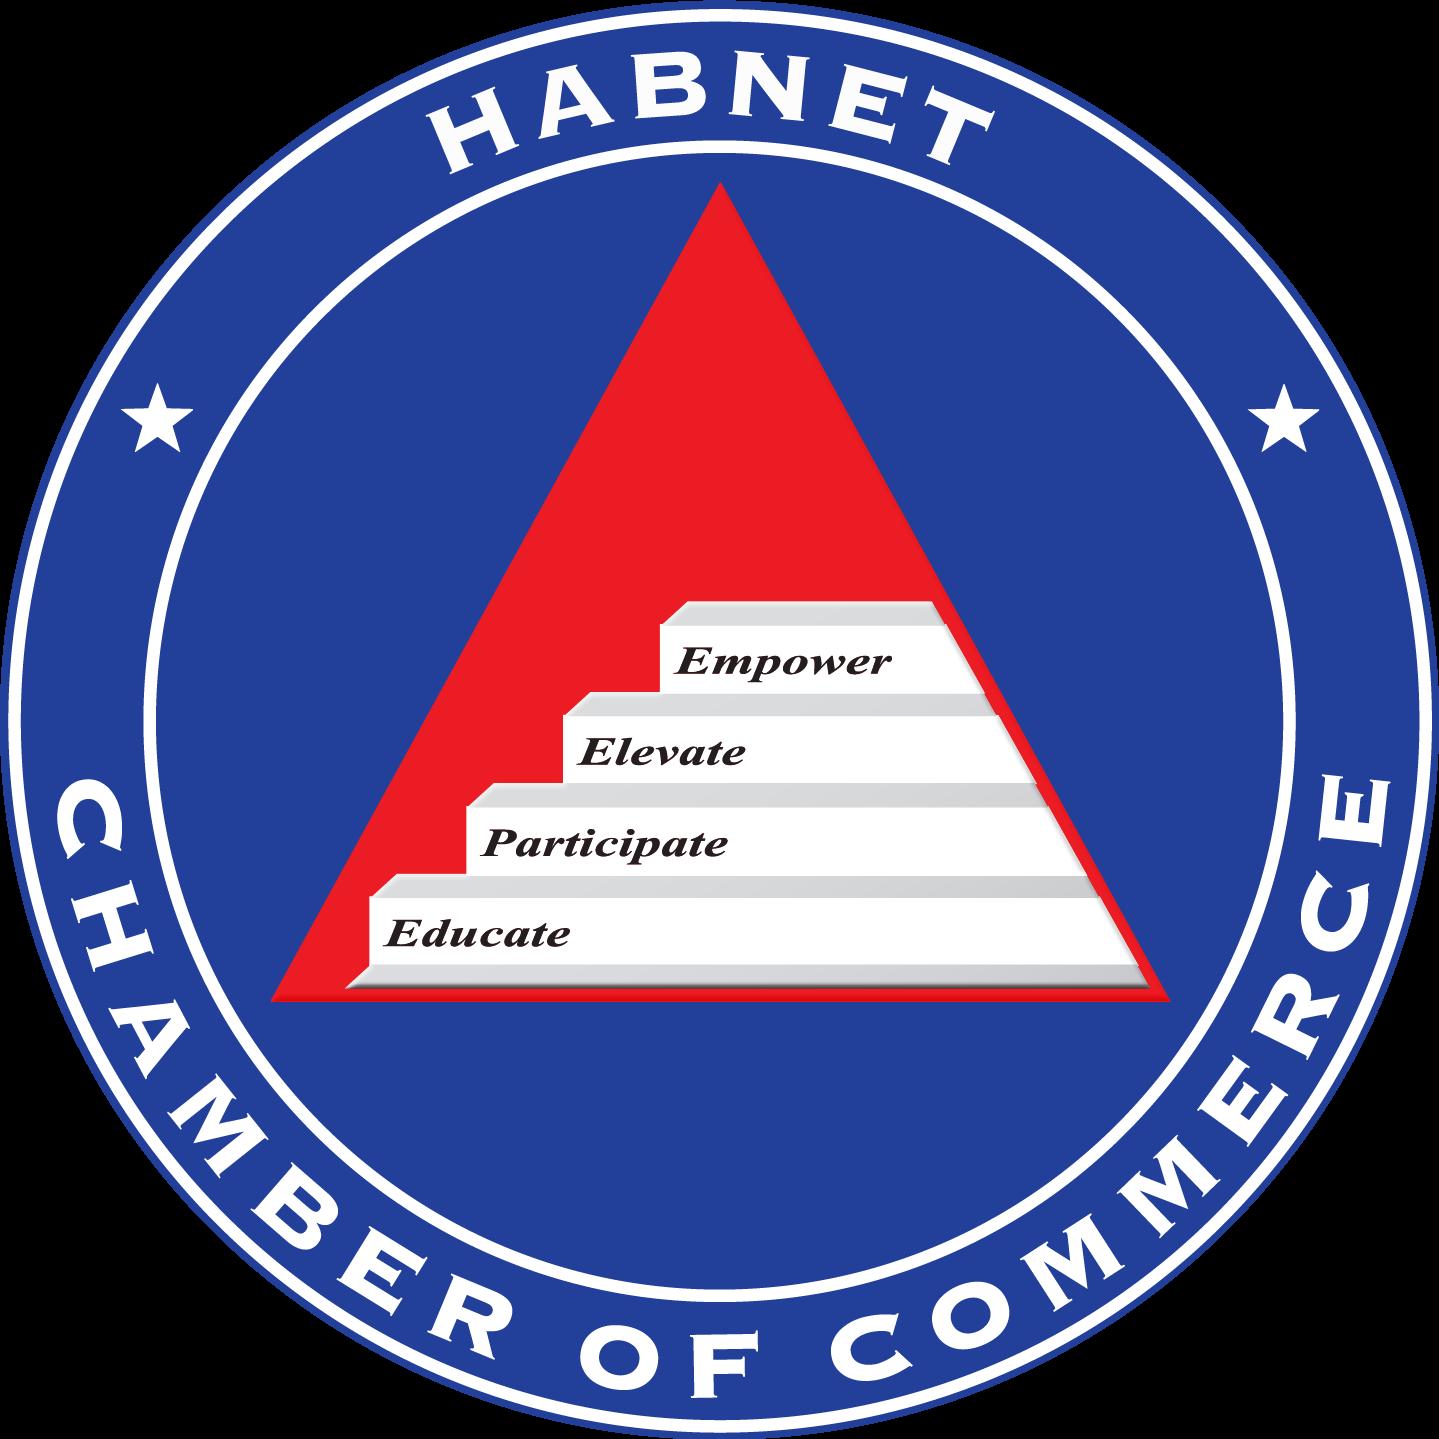 HABNET Store